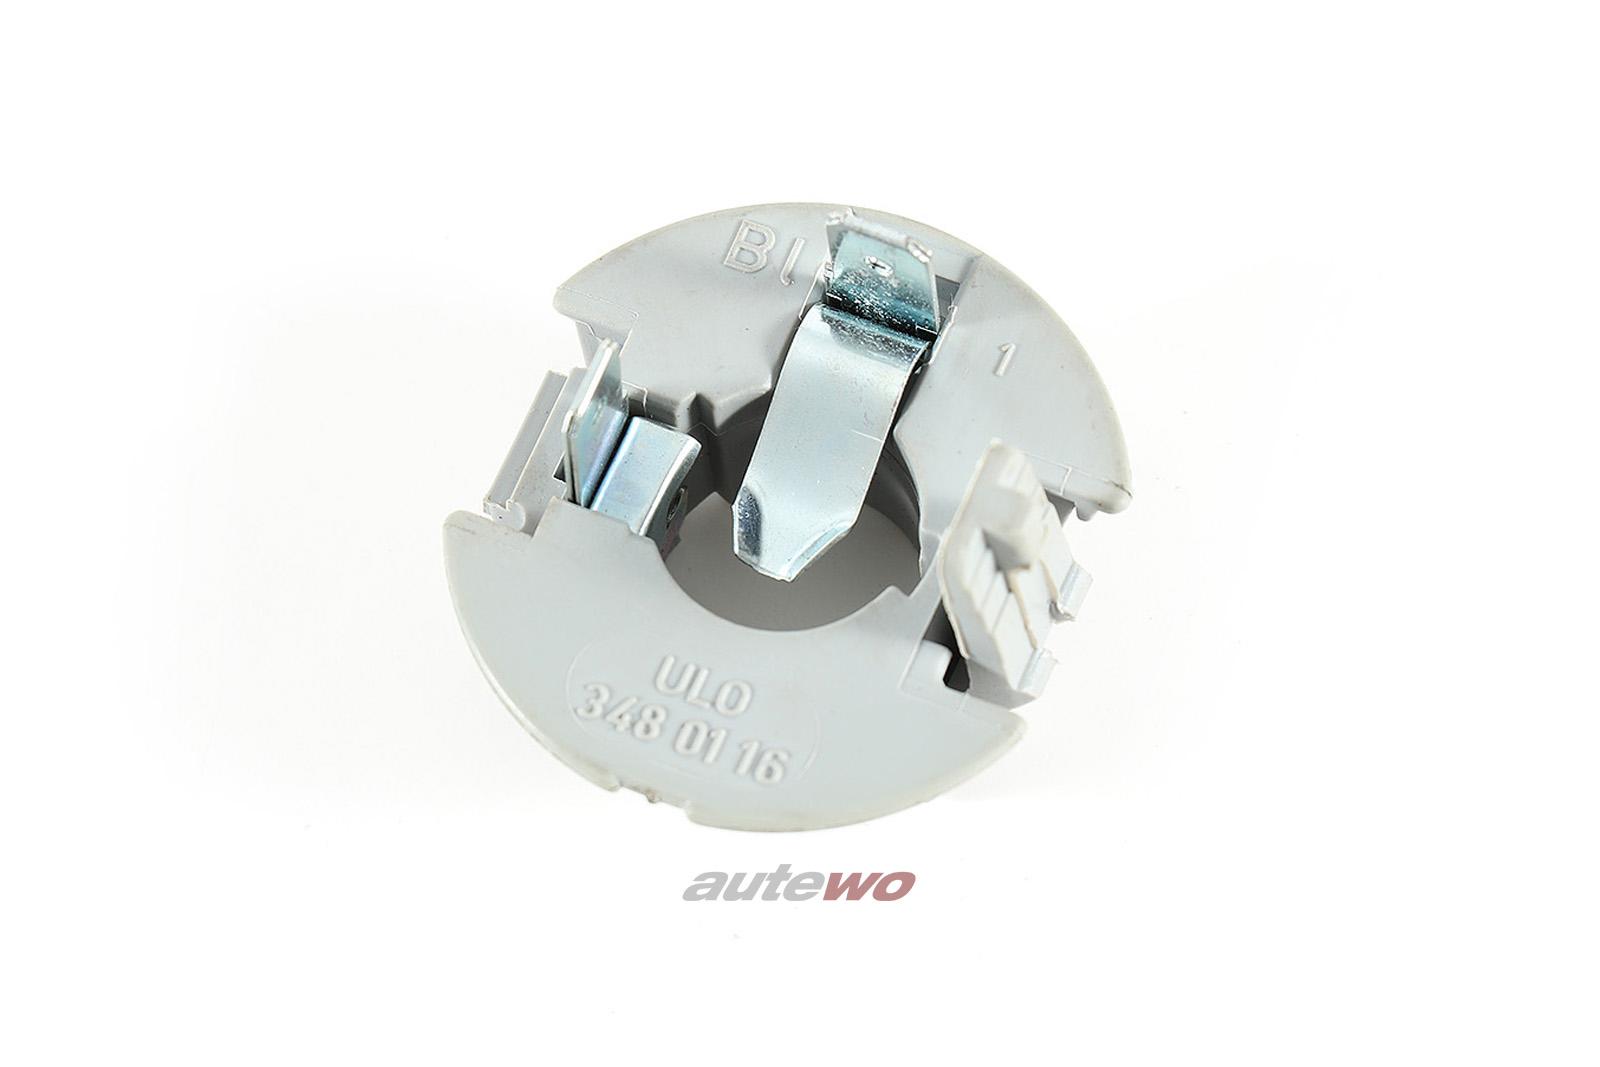 171953053 ULO 348 01 16 VW Scirocco 1/Jetta/T2 Bus Lampenfassung Blinker